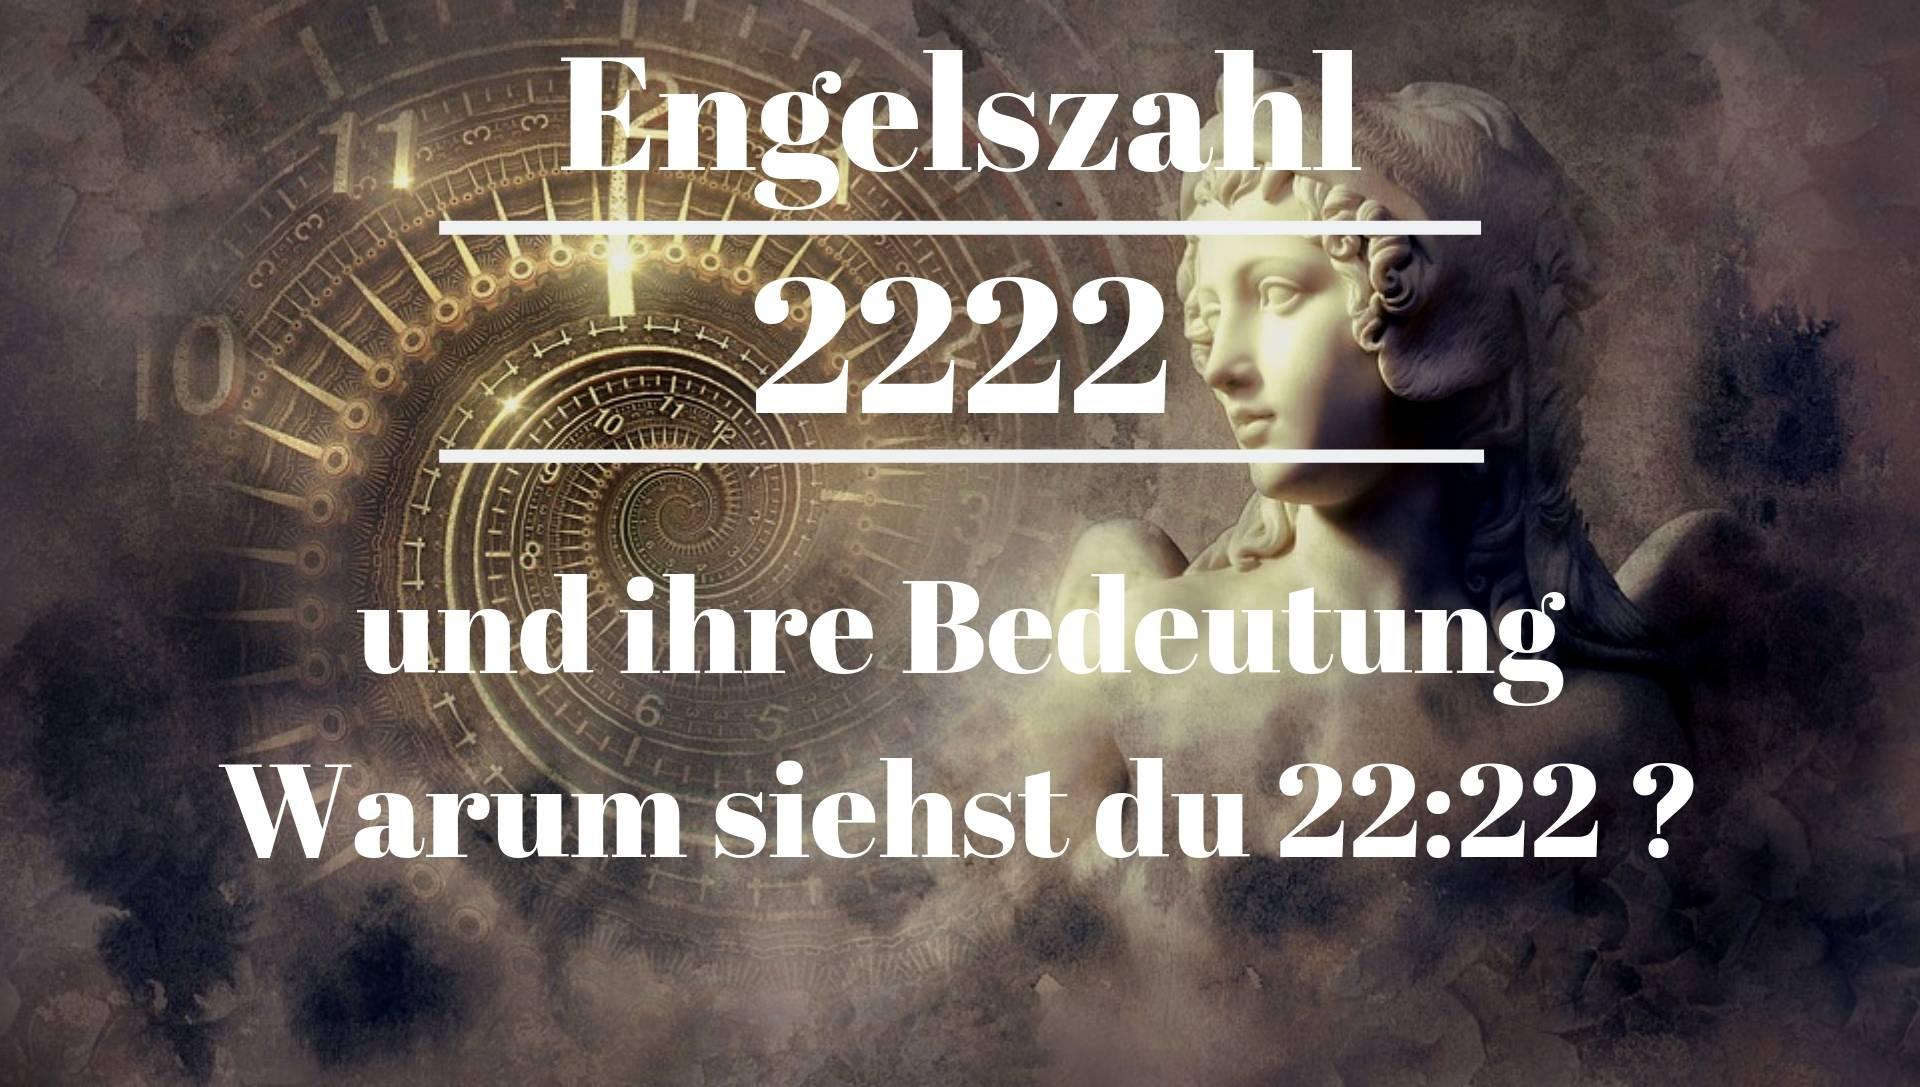 Bedeutung 2222